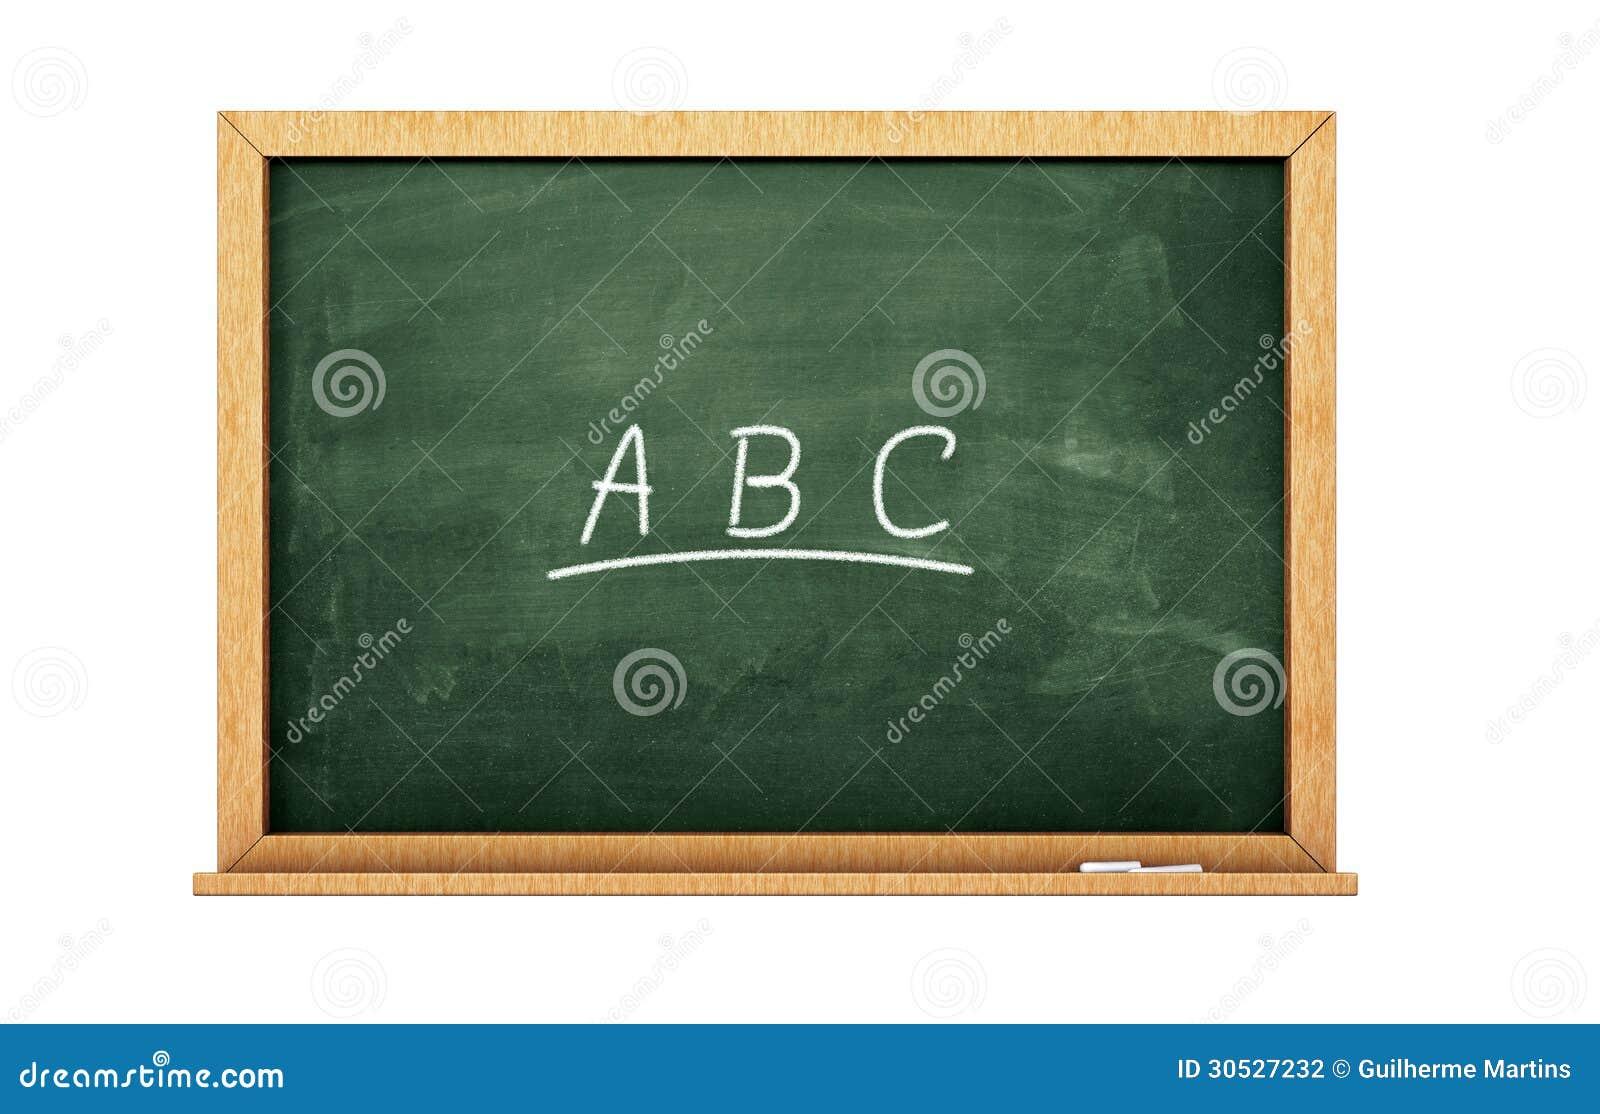 abc chalkboard stock photography image 30527232